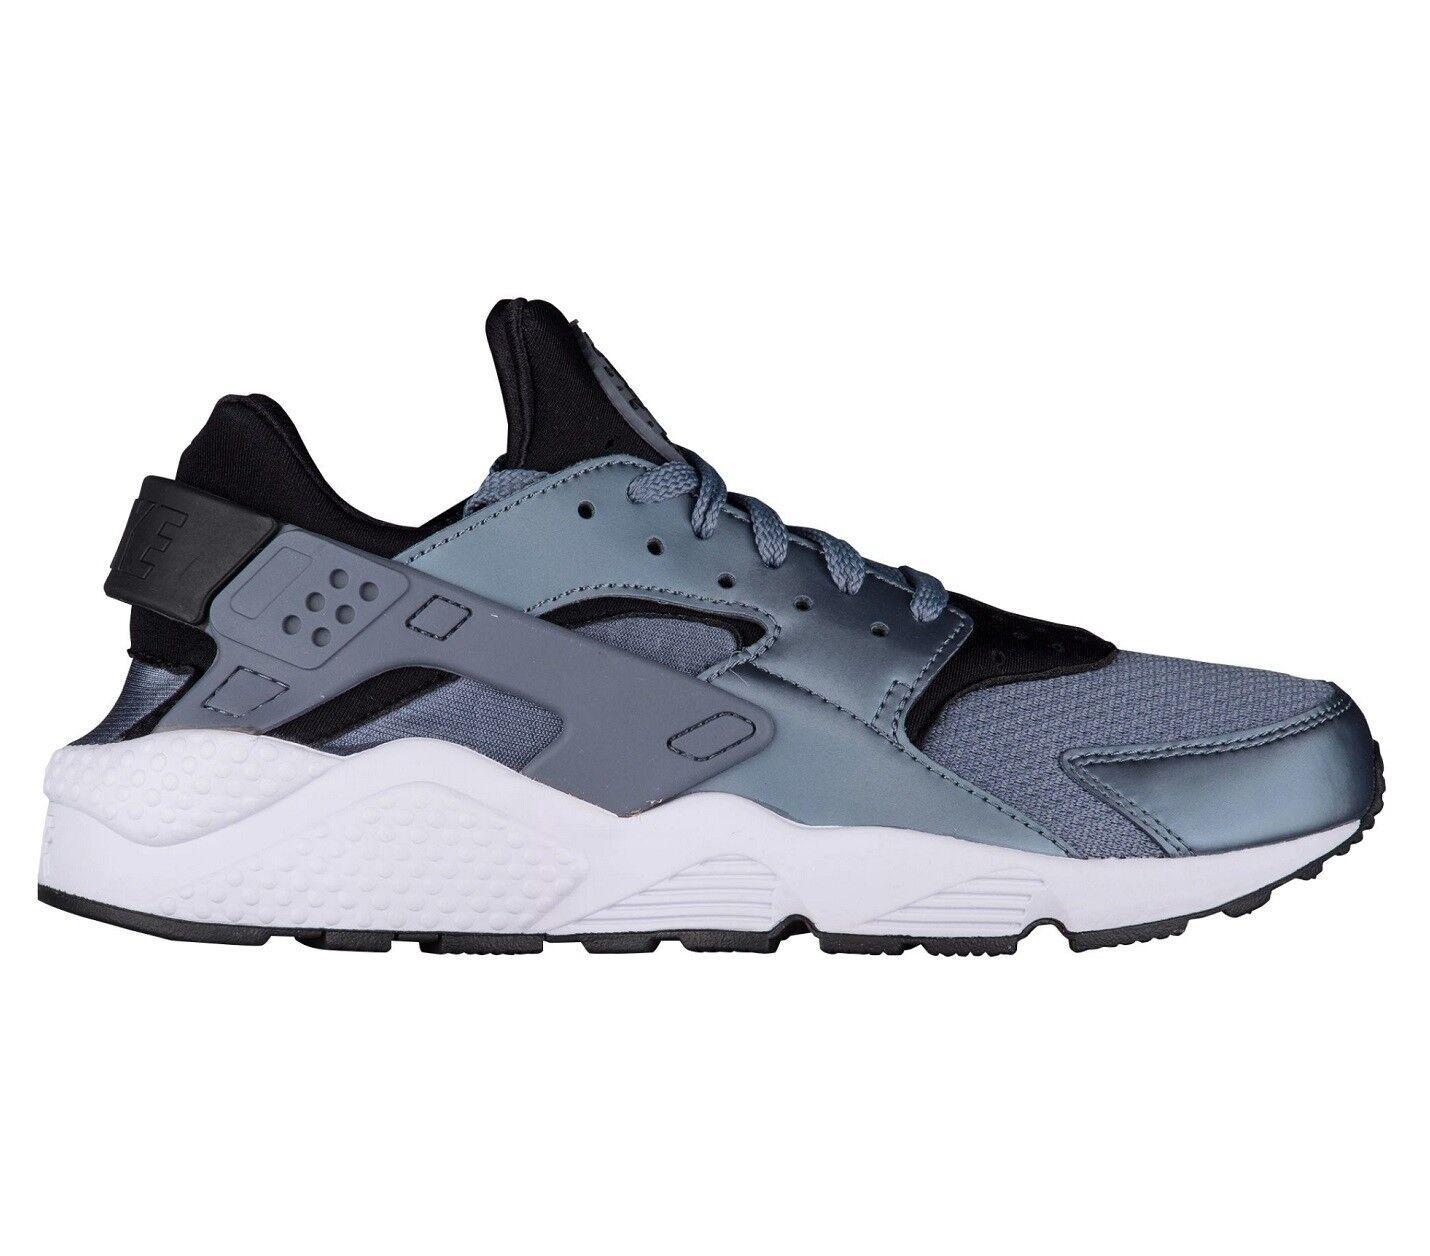 Nike Air Huarache Mens 318429-419 Armory Blue Black Running Shoes Comfortable Brand discount